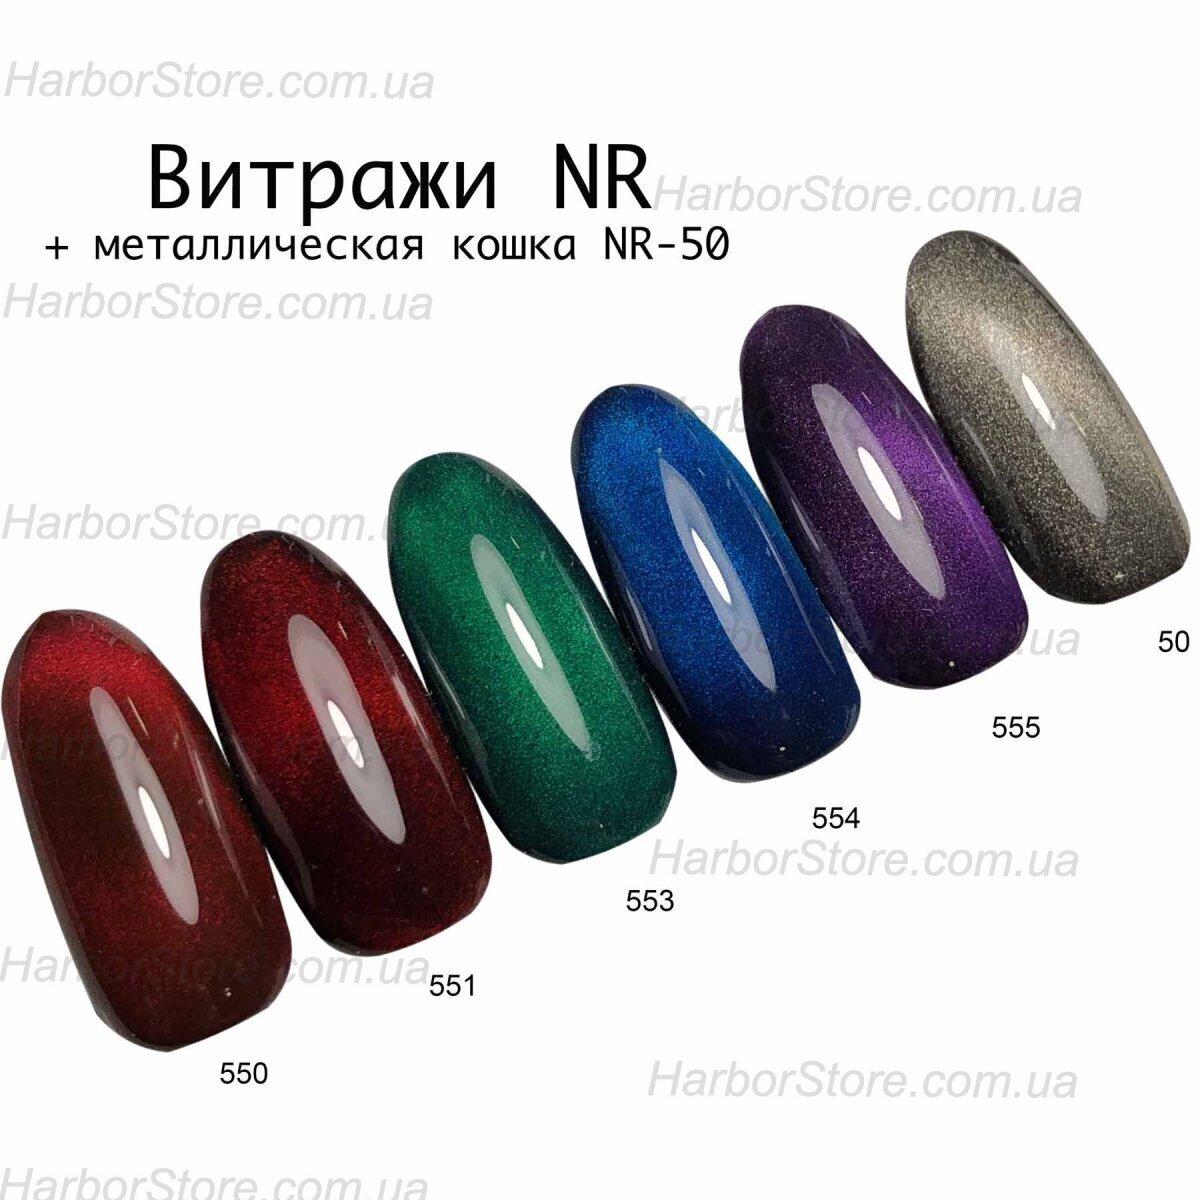 NR 550